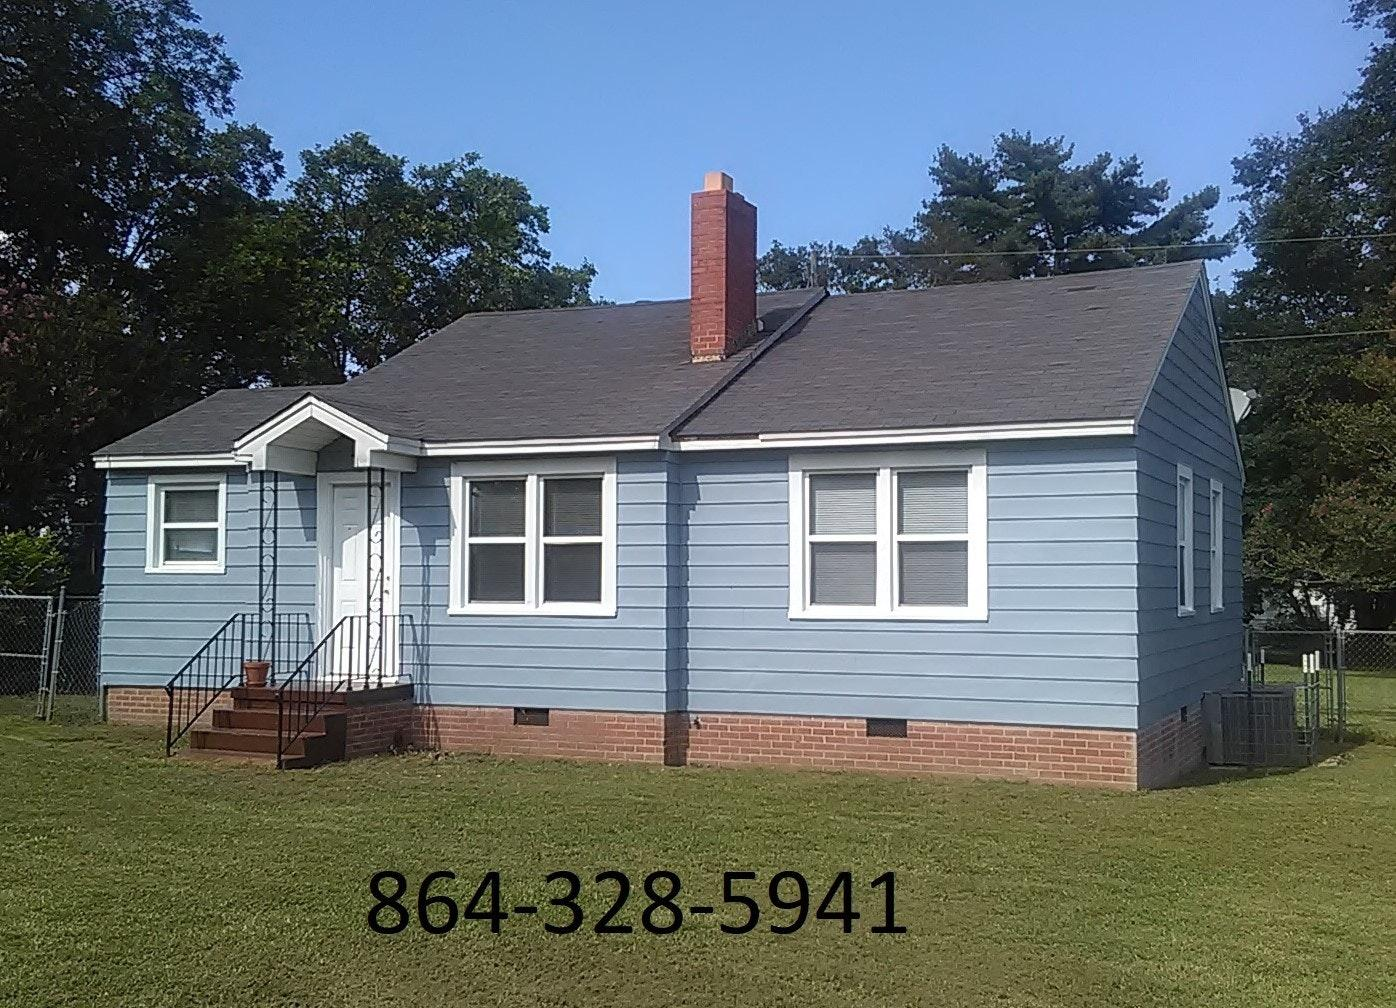 101 Ashley Ave For Rent - Anderson, SC | Trulia